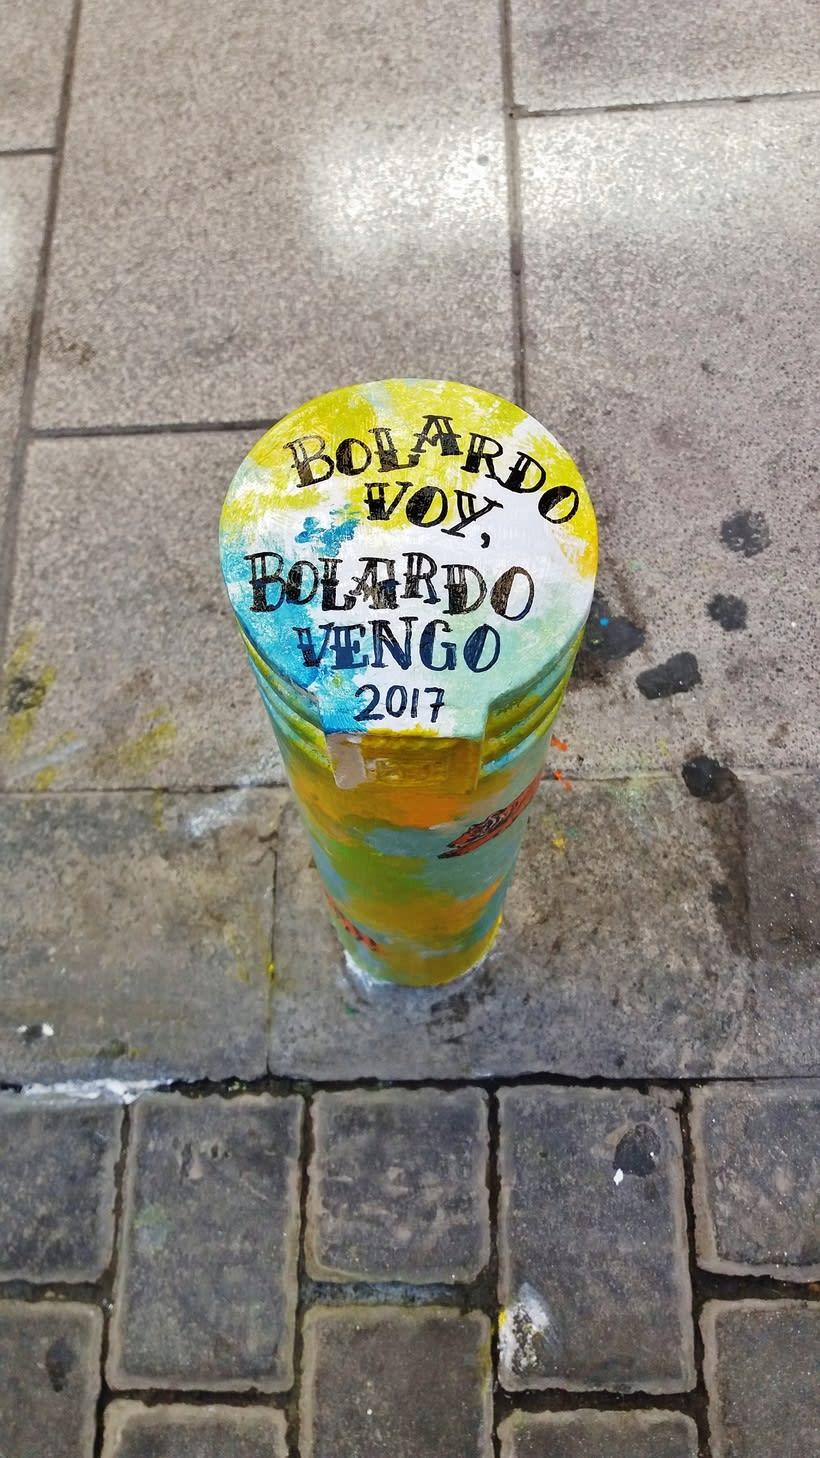 Bolardo voy, bolardo vengo (2017) 12